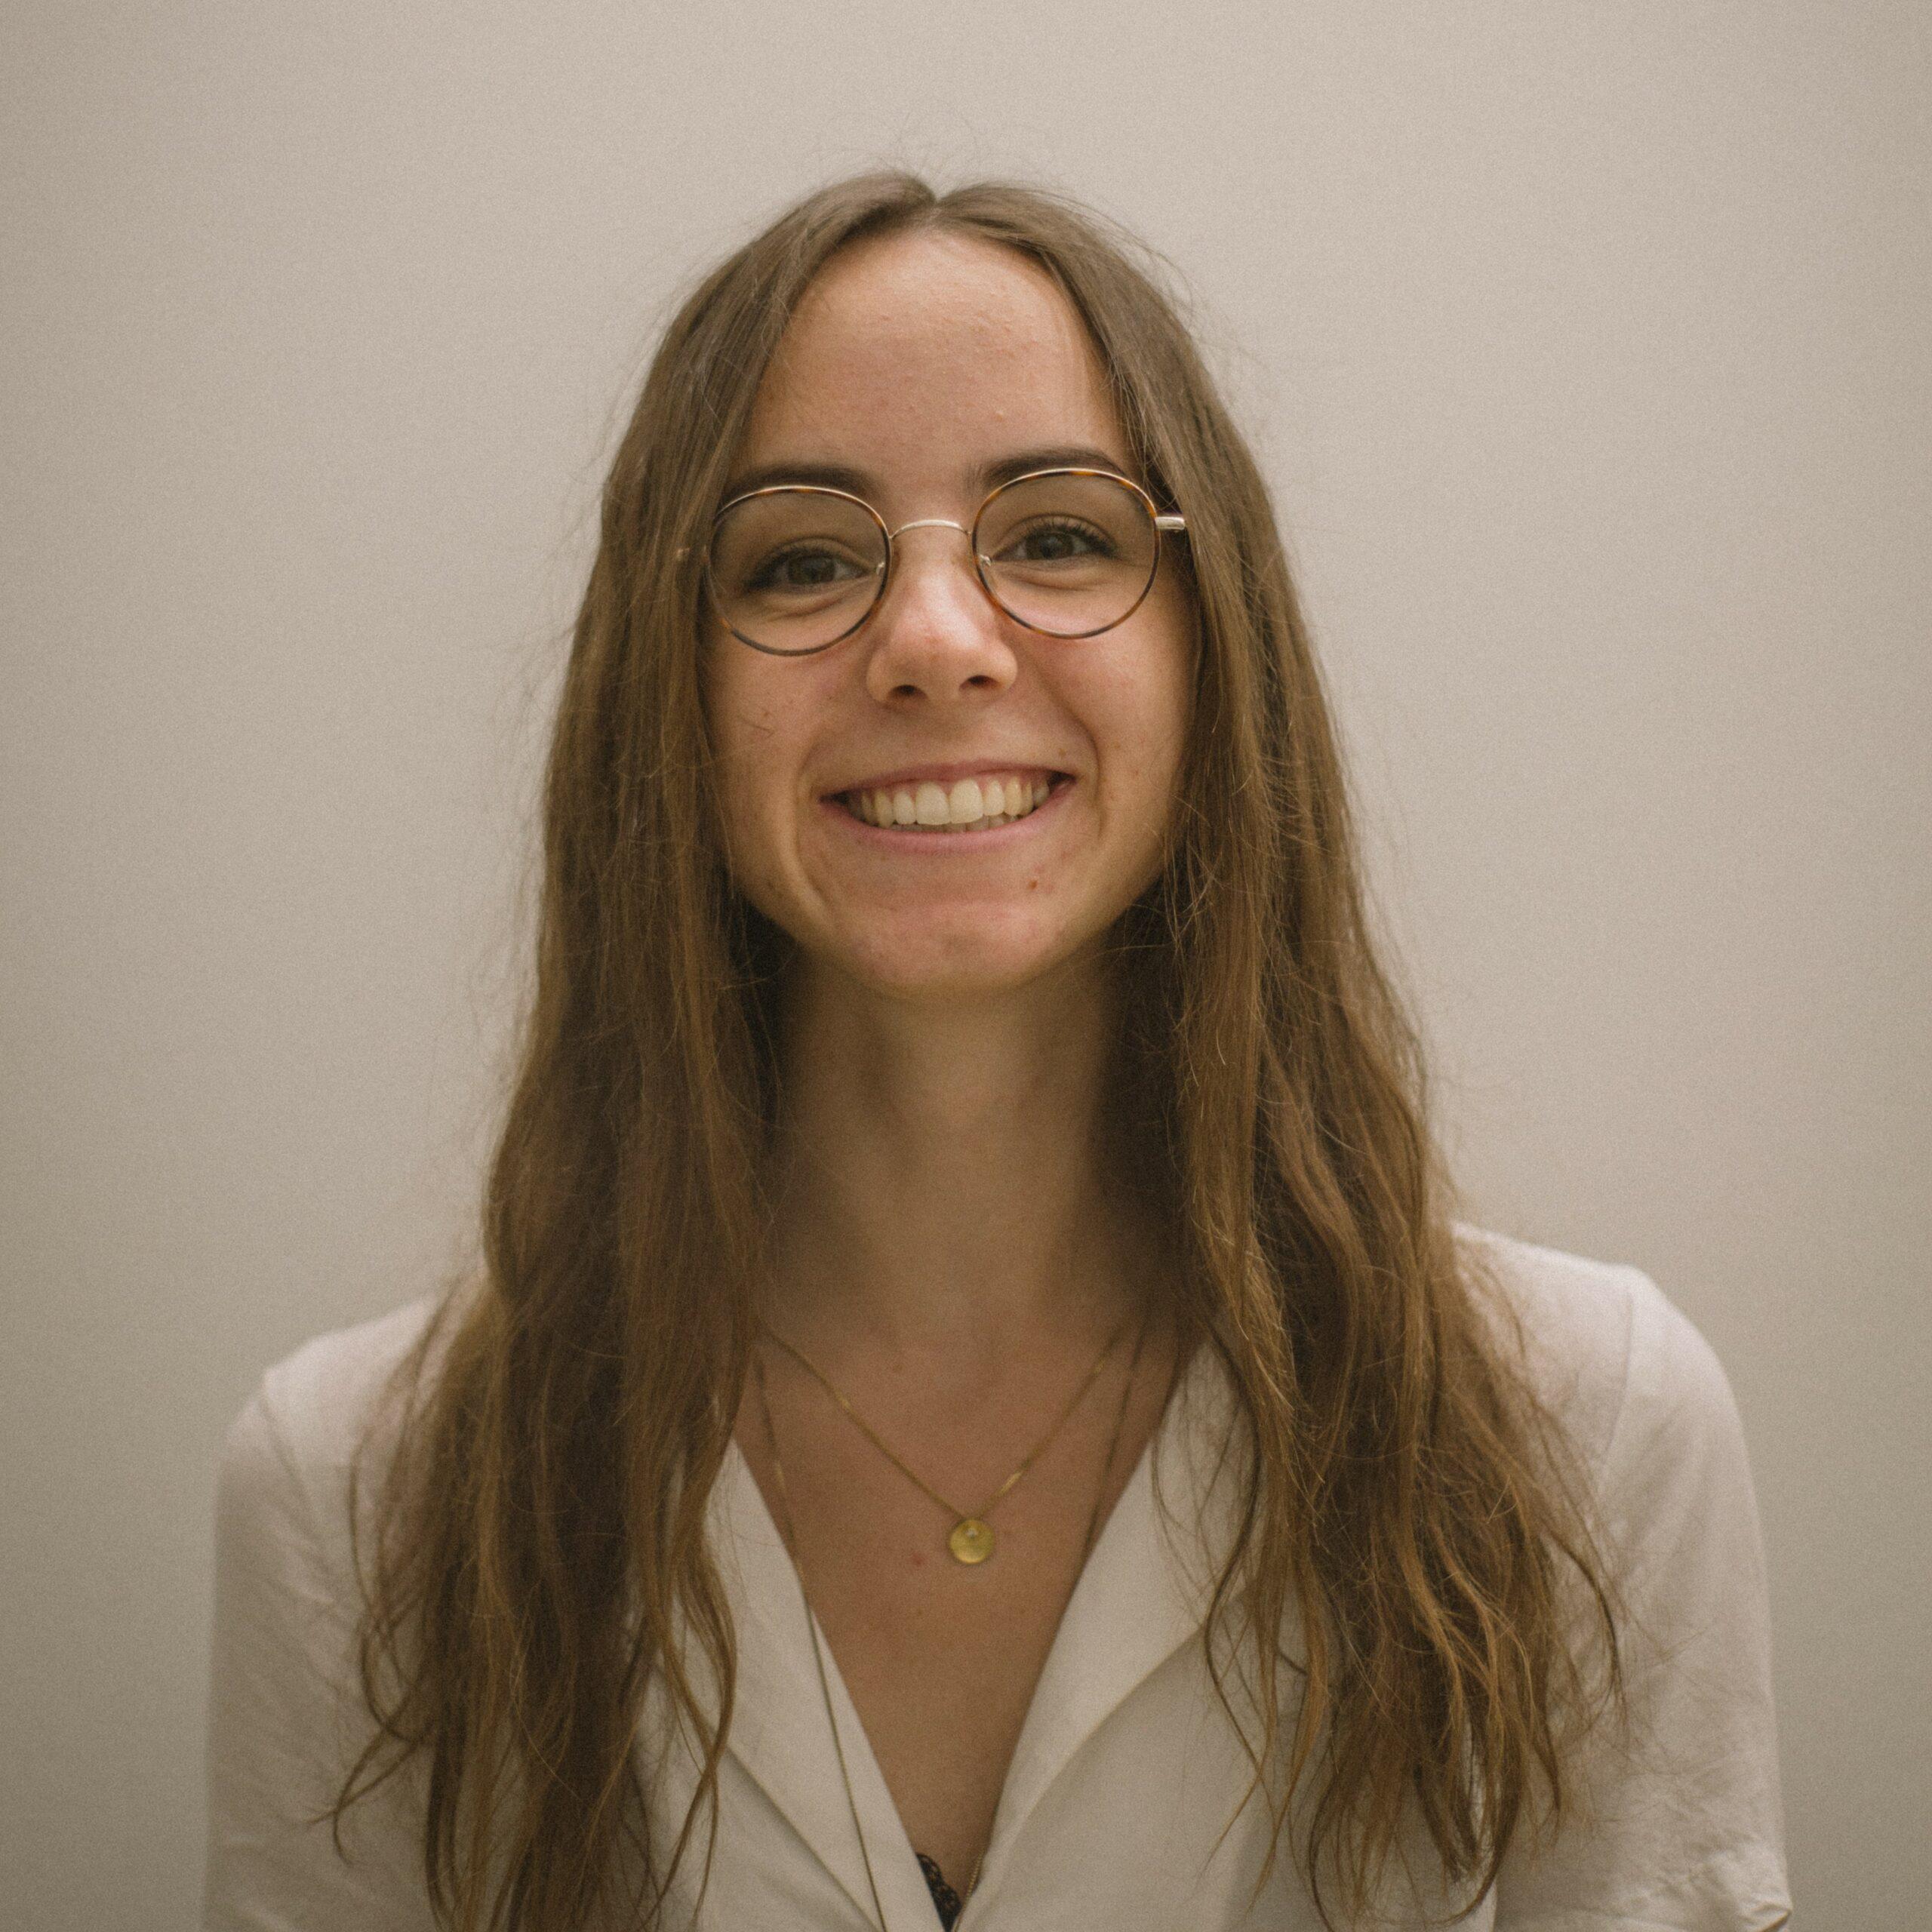 Annica Brommann